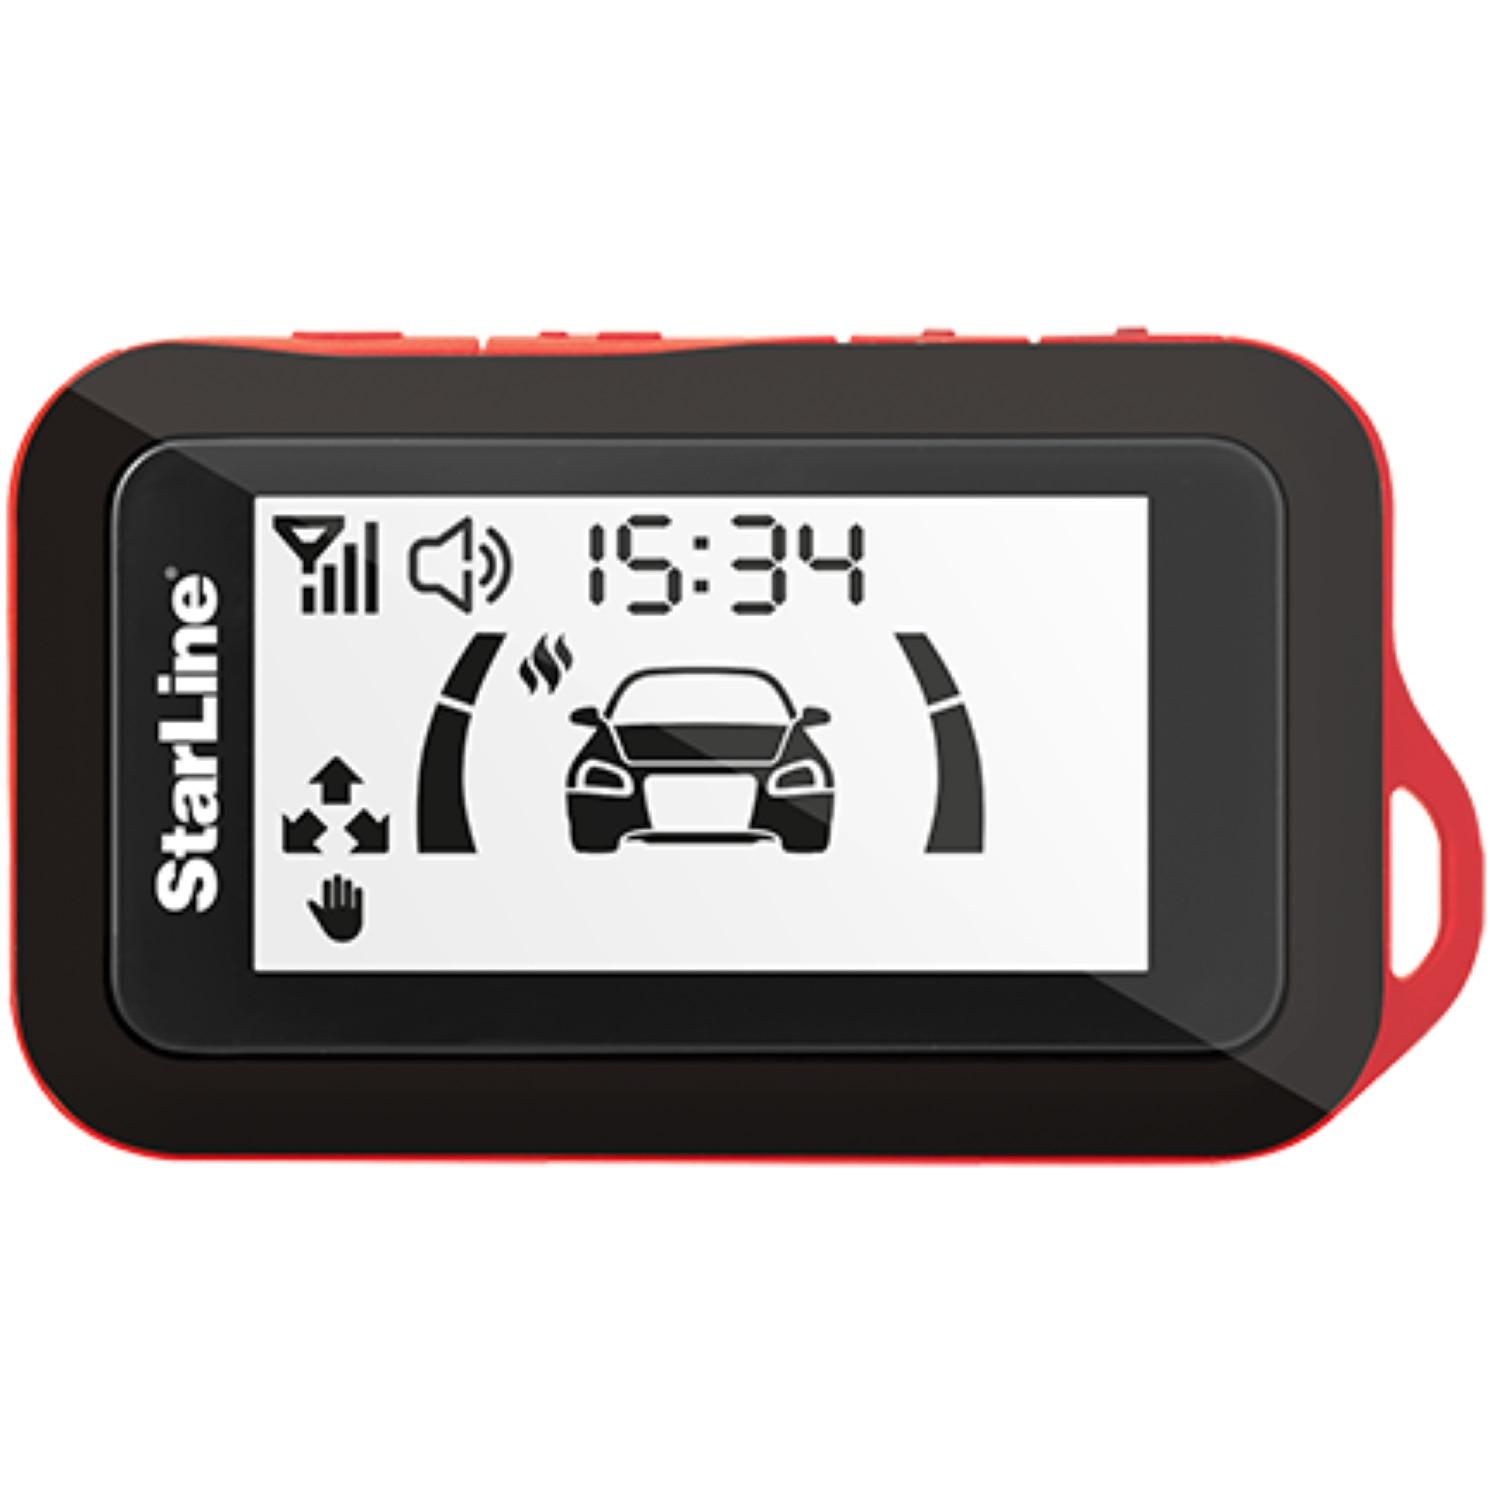 Fotografie Alarma auto Can Bus, Telecomanda Pager, Bluetooth Smart Control, Senzor soc 3D, Mod Super Slave, Functie Hands Free